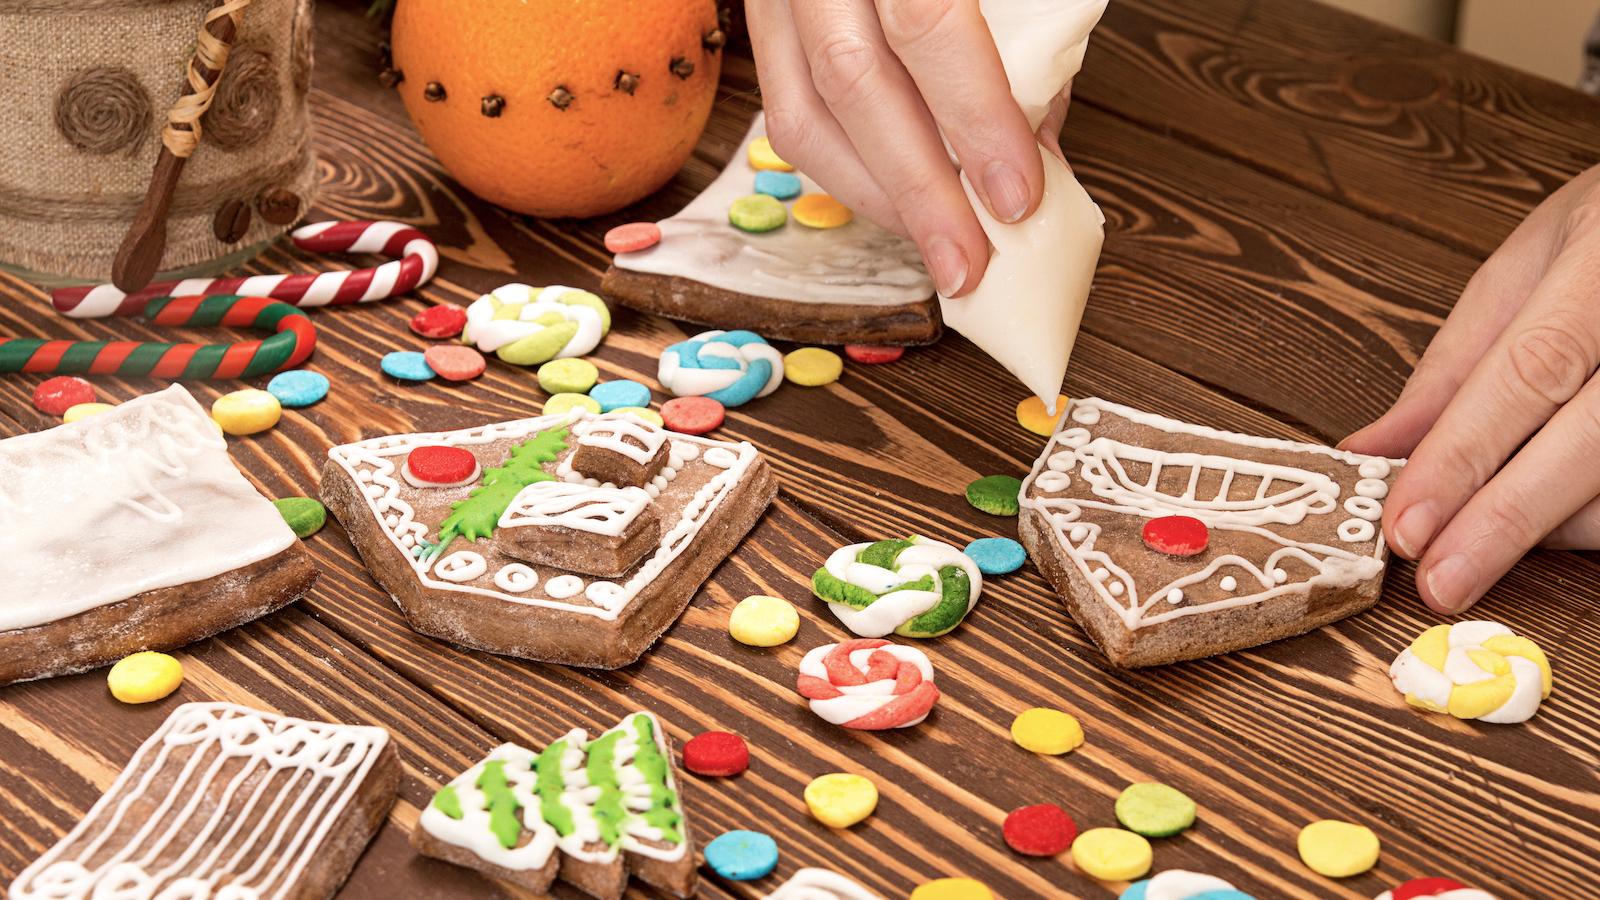 Holiday Classroom Games Activities Christmas Hanukkah Kwanzaa Houghton Mifflin Harcourt